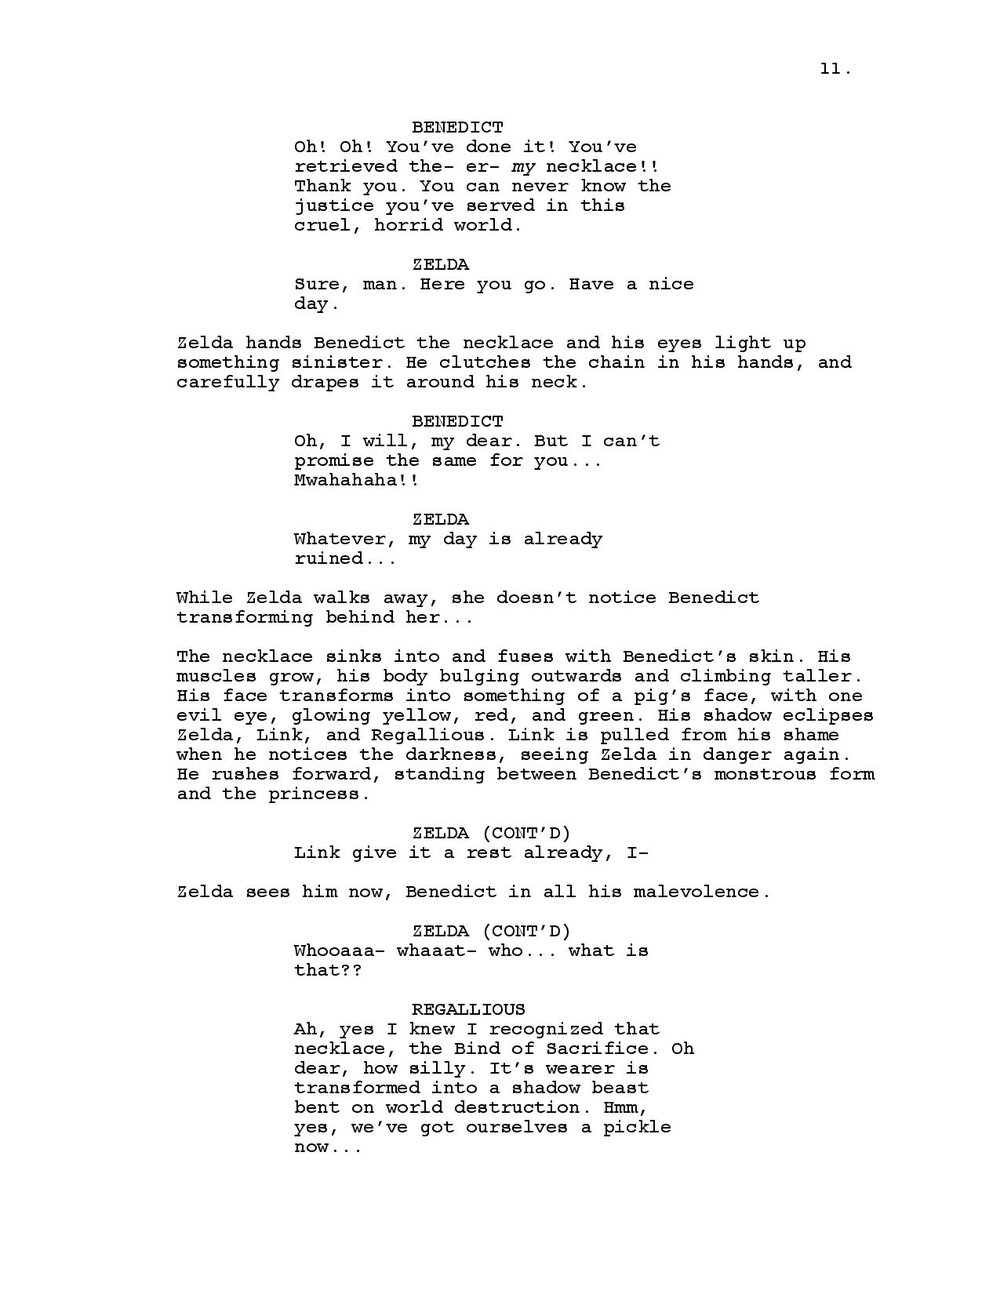 TheAdventuresofZelda&Link_Pilot-page-011.jpg